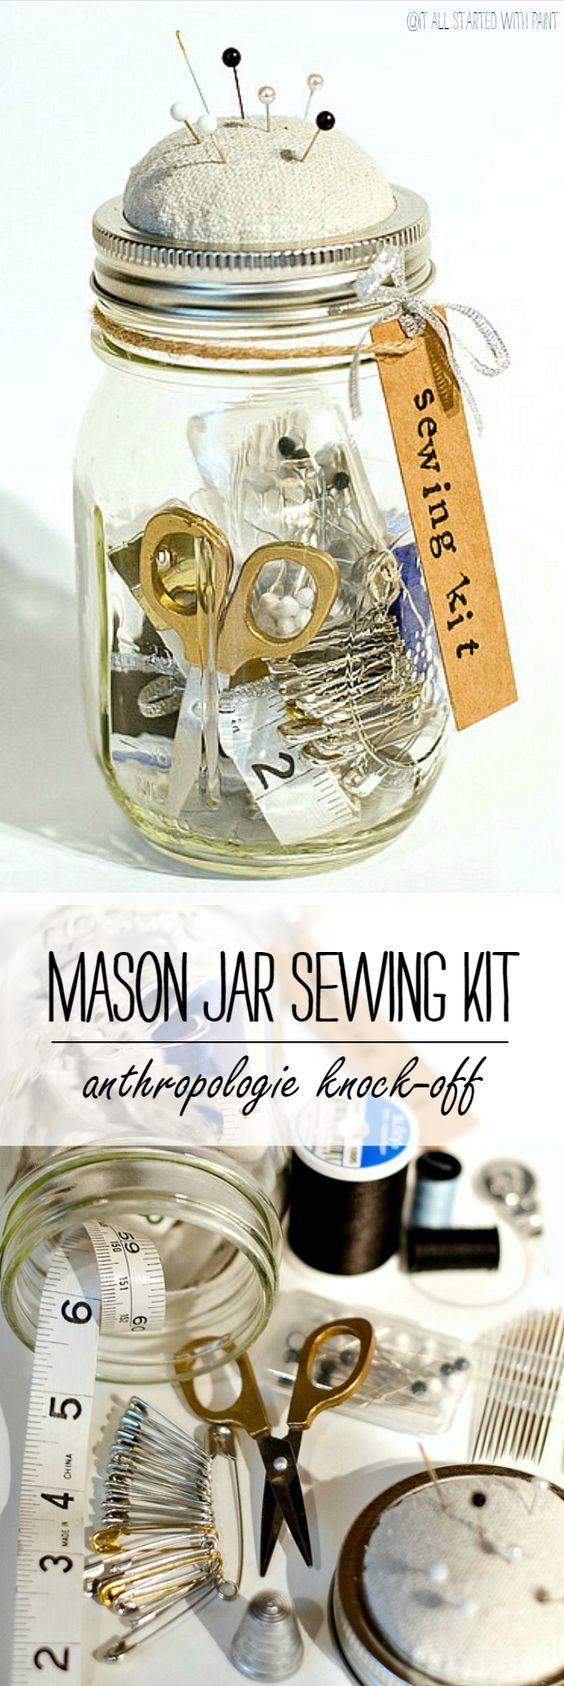 Anthropologie Mason Jar Sewing Kit Craft Idea